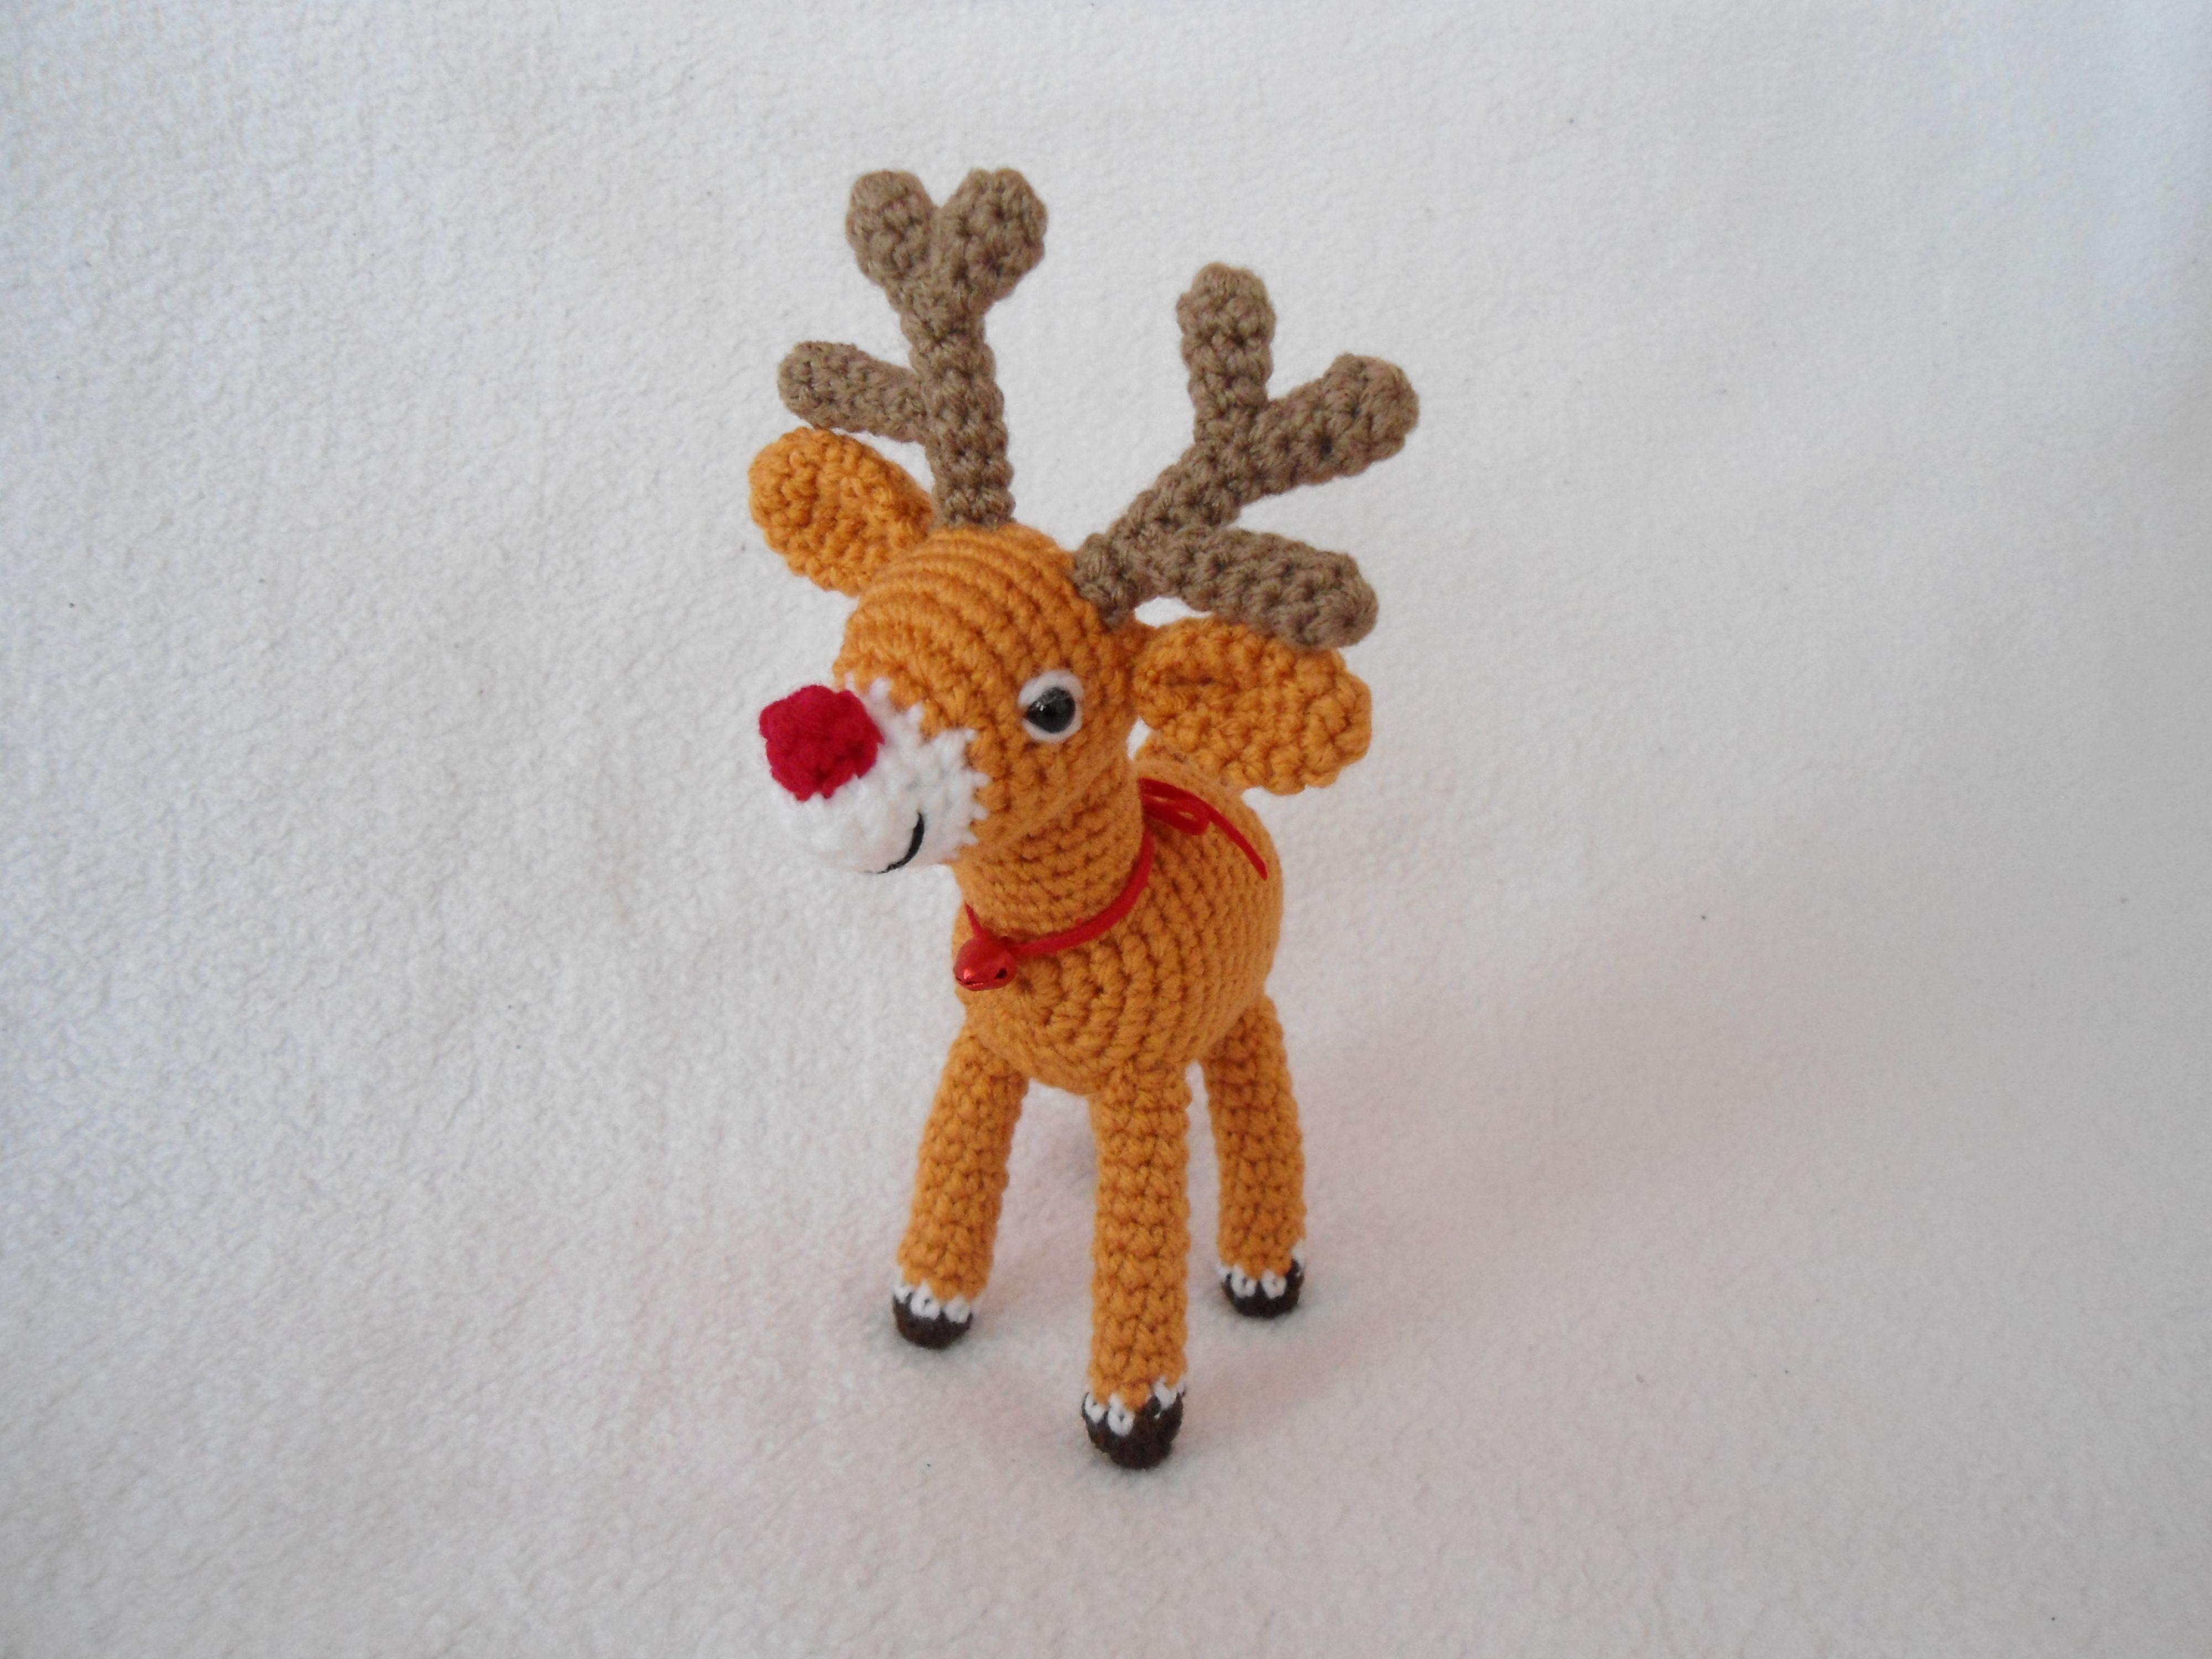 Reindeer crochet pattern knitting and crochet pinterest reindeer crochet pattern bankloansurffo Choice Image